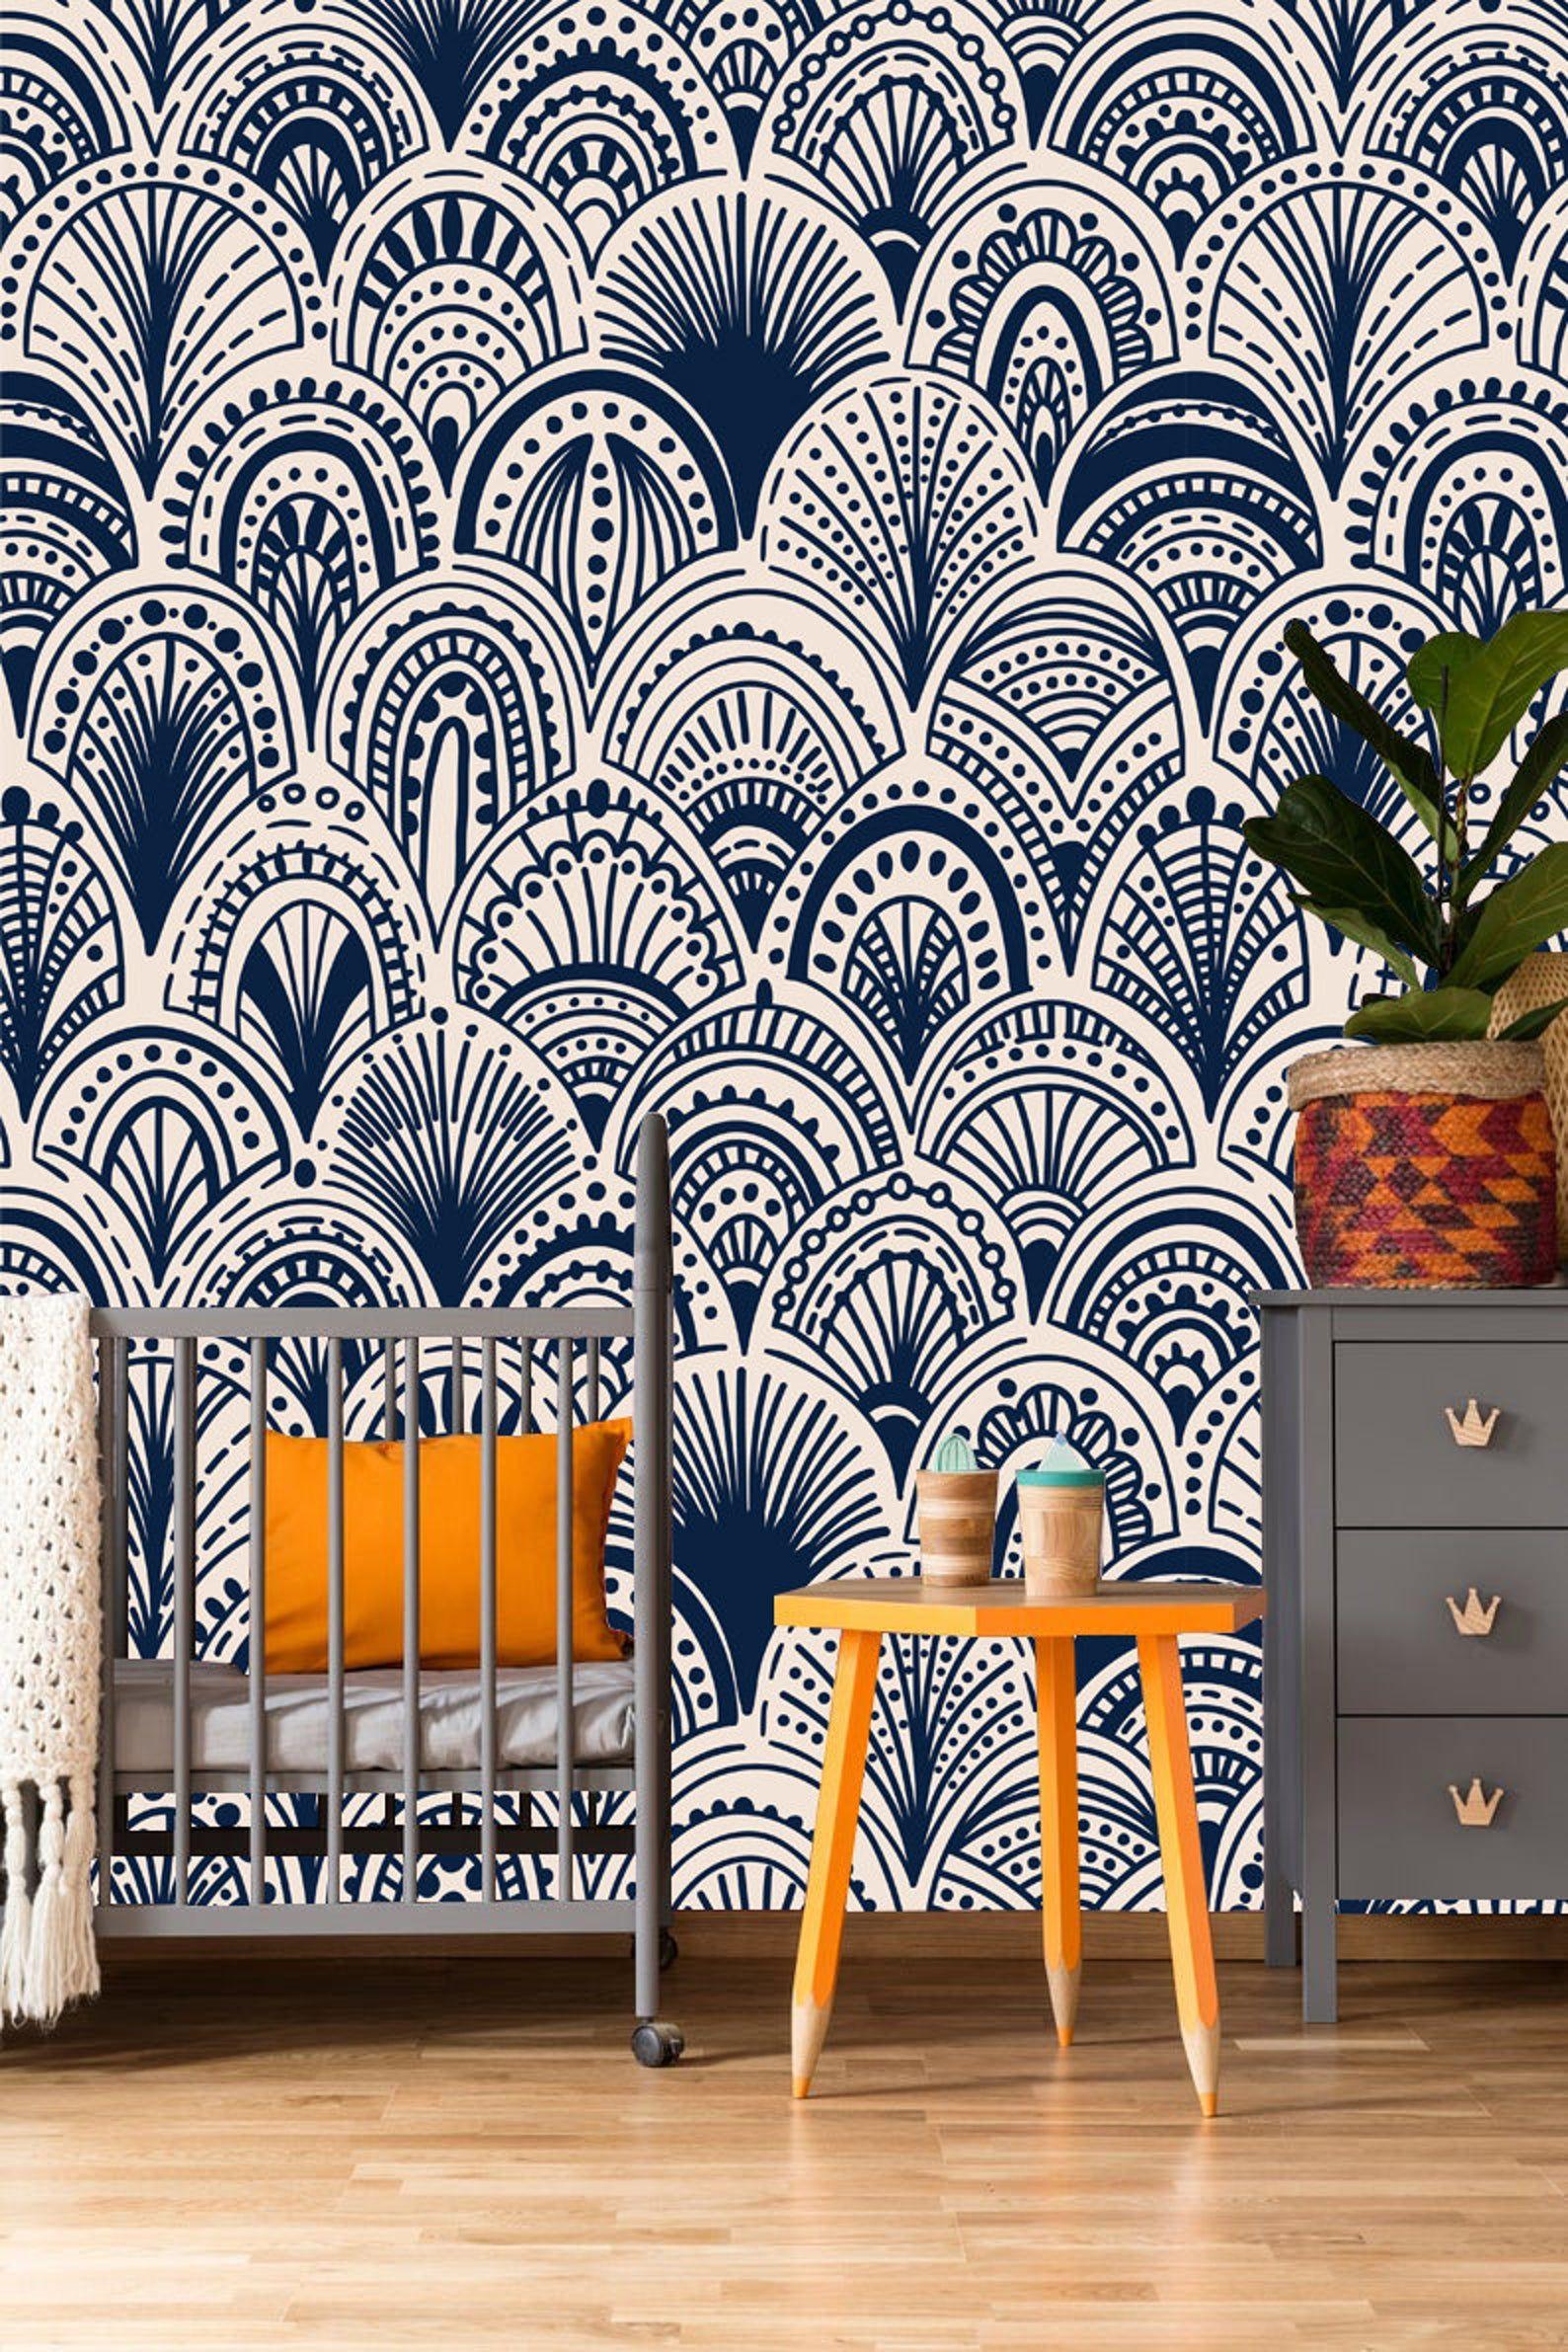 Blue Bohemian Removable Removable Wallpaper Peel Stick Etsy Removable Wallpaper Blue Walls Self Adhesive Wallpaper